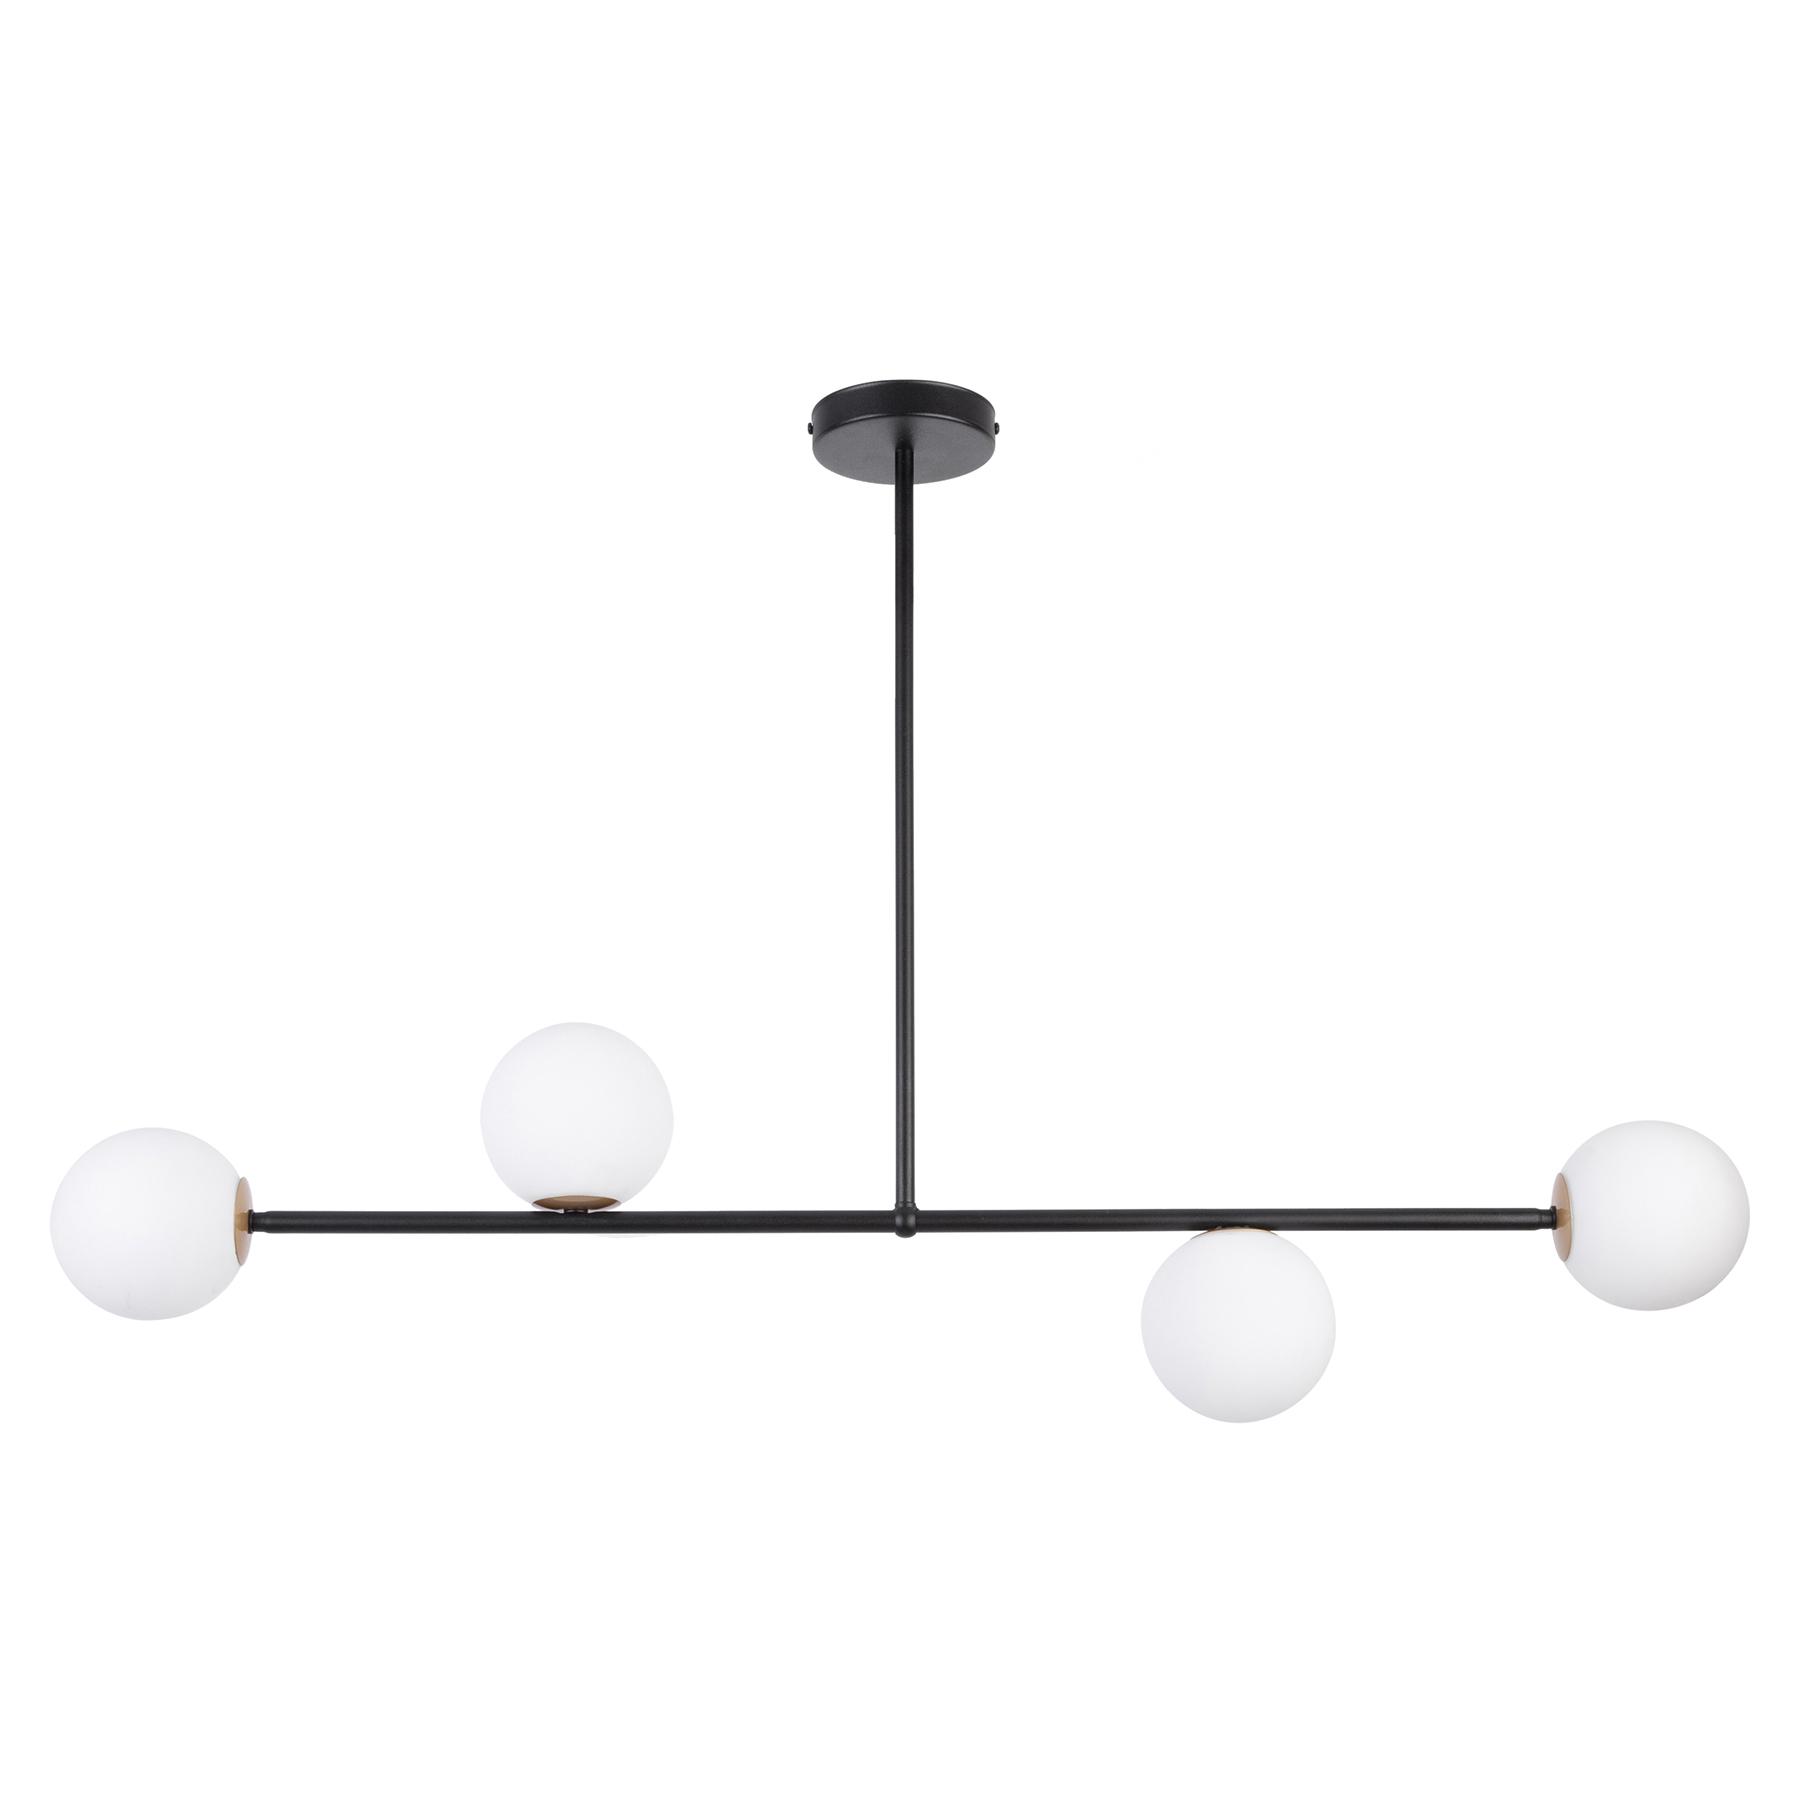 Hanglamp Gama 4, 4-lamps, zwart